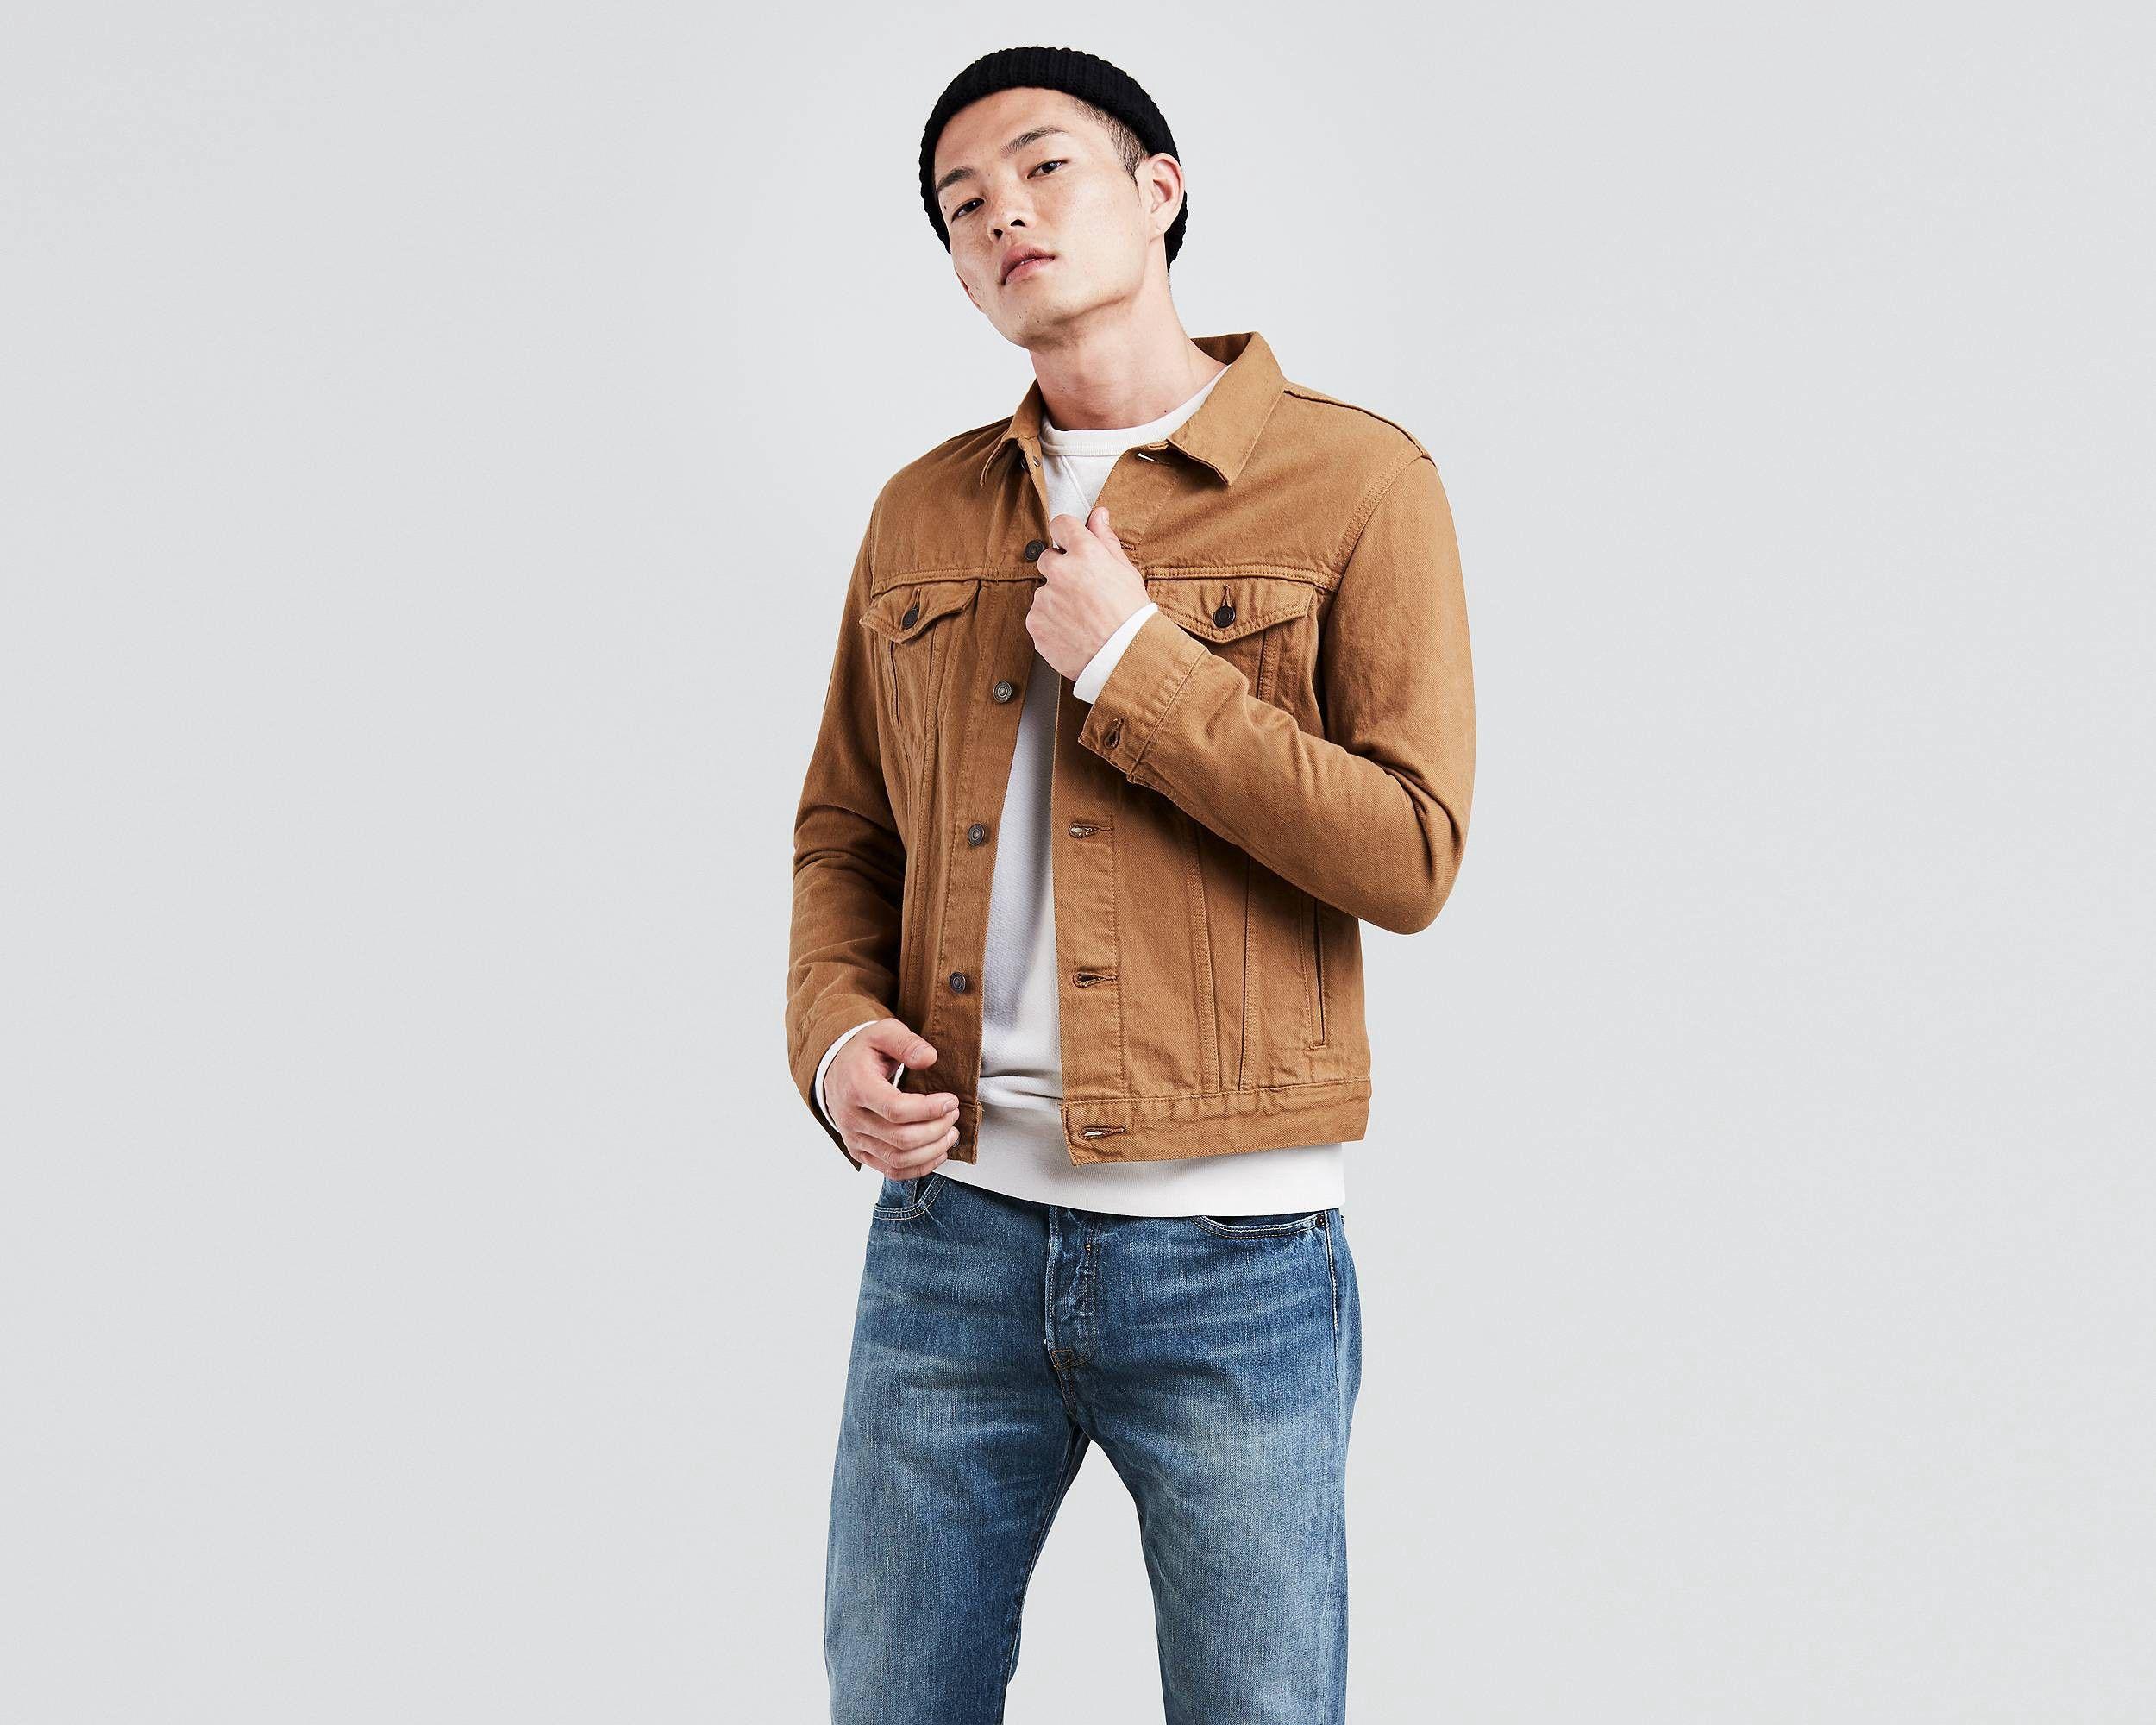 Levi S Trucker Jacket Caraway Xs Denim Jacket Men Jean Jacket Outfits Trucker Jacket [ 2000 x 2500 Pixel ]